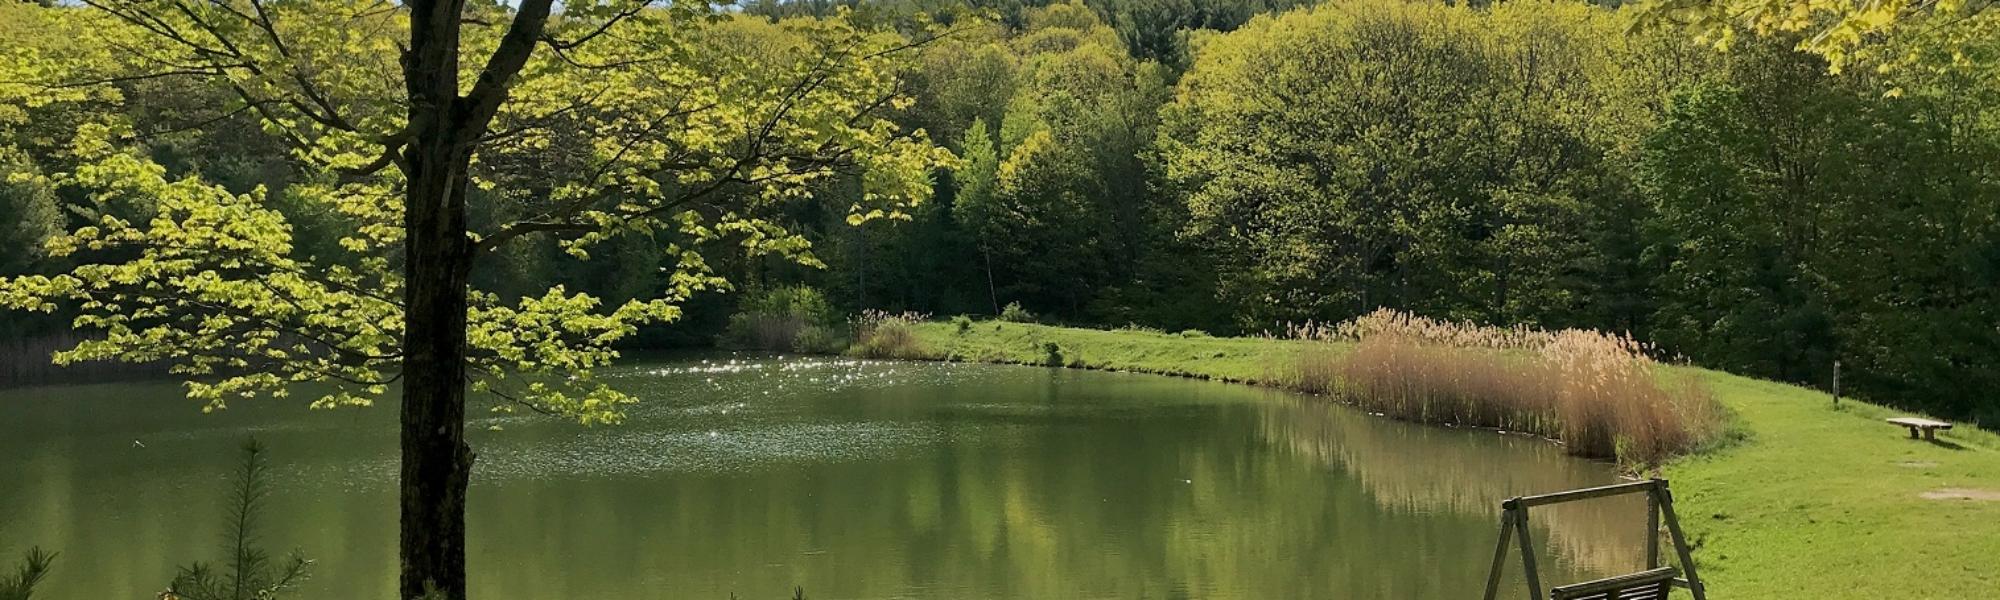 June_Archer_Jon's Pond_Schor Conservation Area